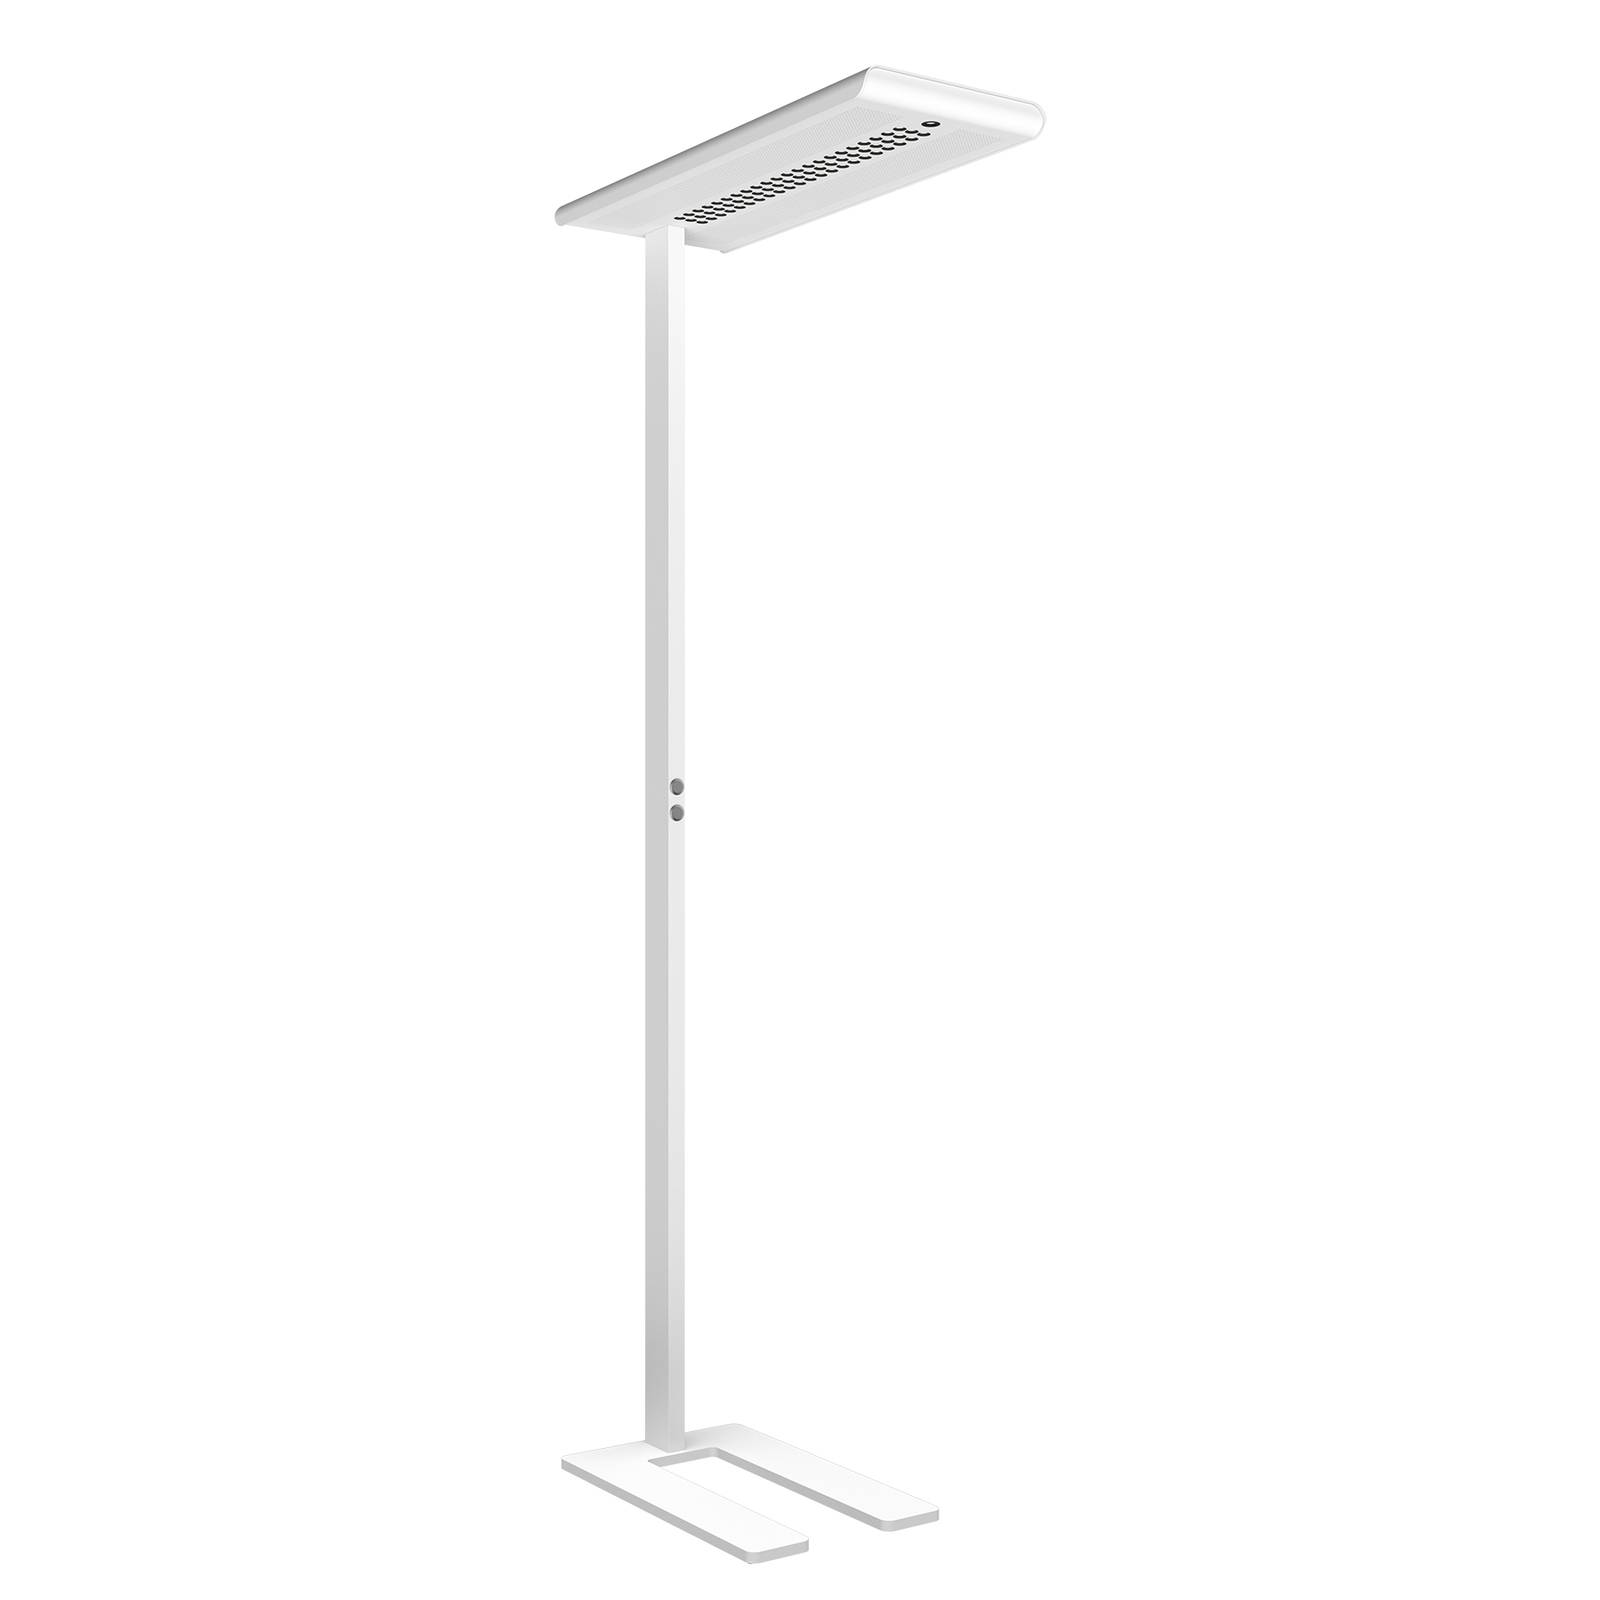 LED-Stehleuchte Optico weiß 840 85,5W Sensorik